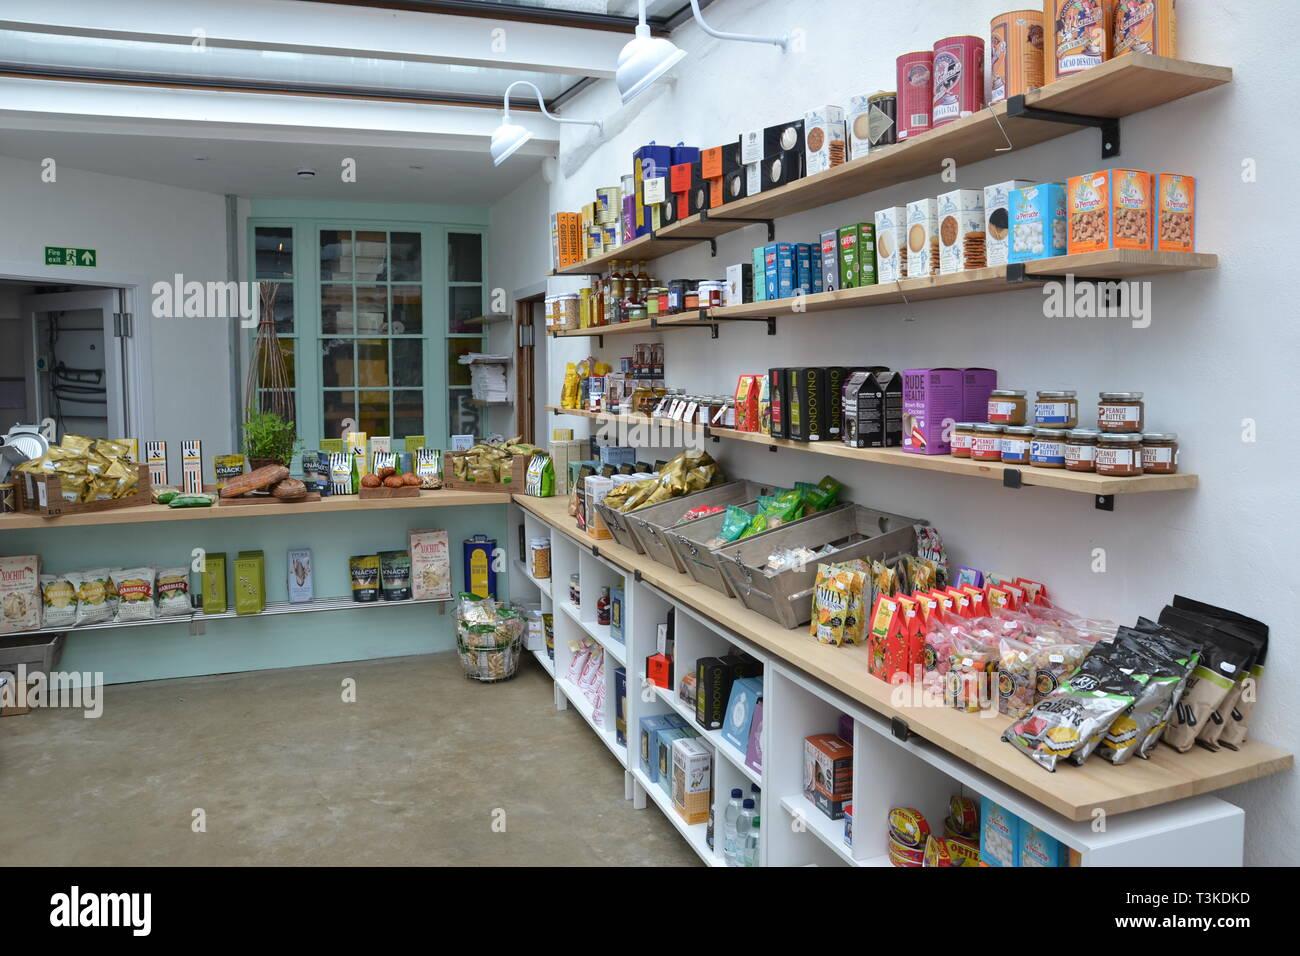 Inside the East Coast Store, Aldeburgh, Suffolk, UK Stock Photo